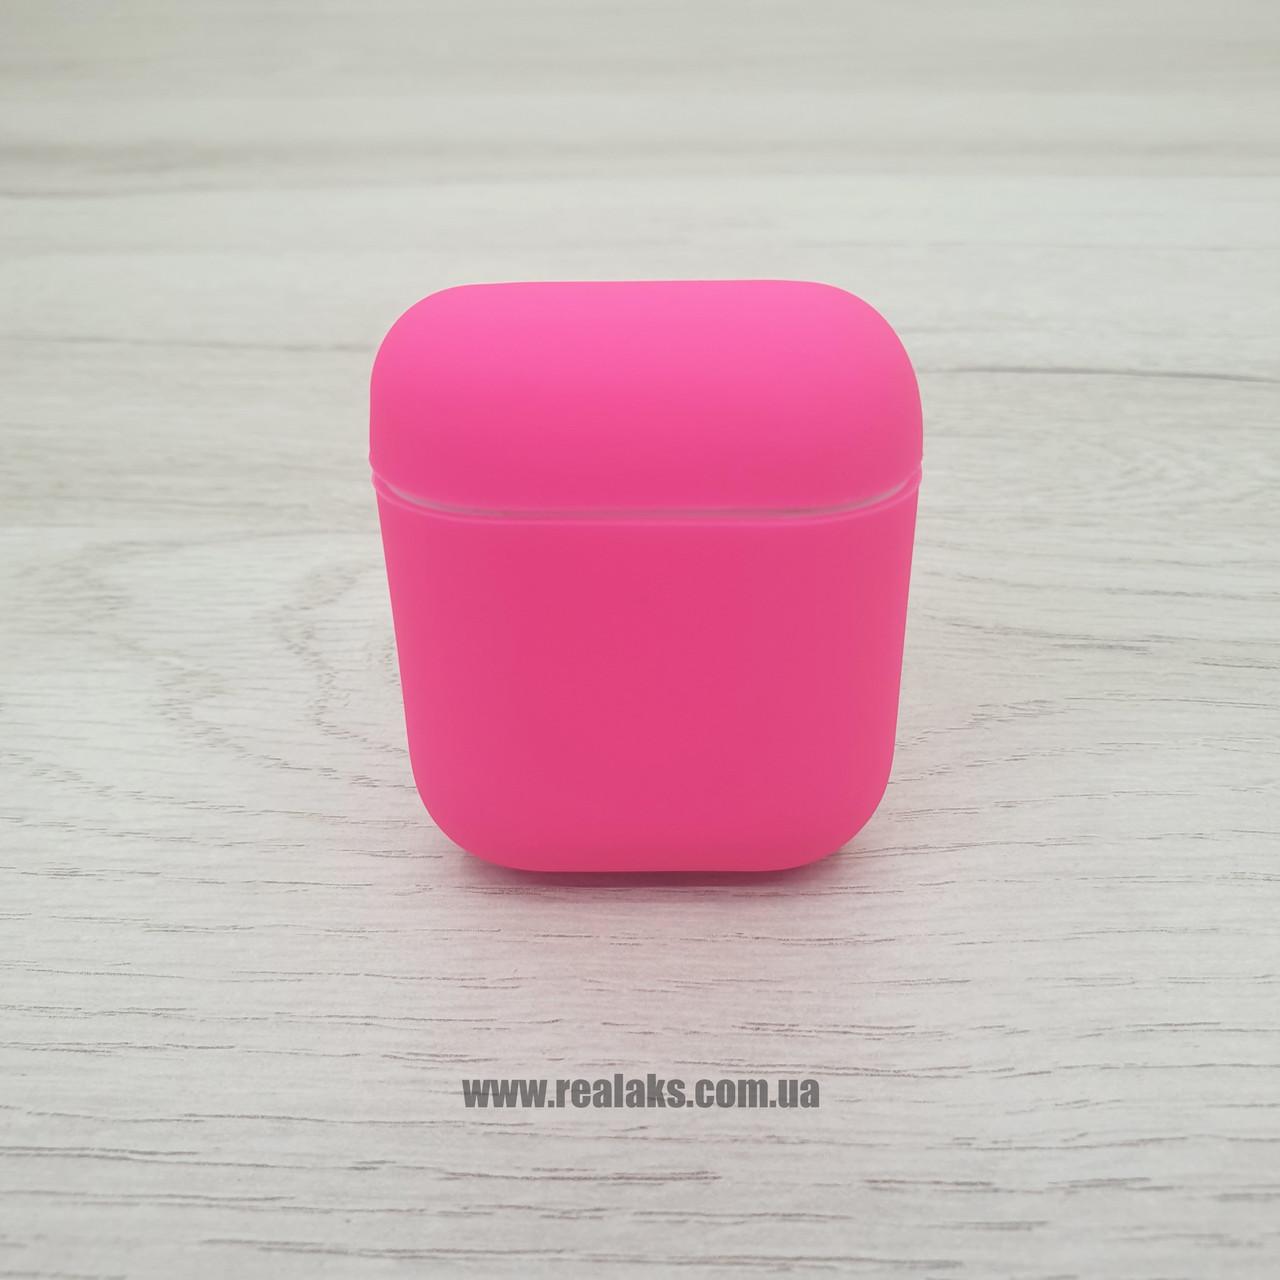 Чохол для навушників AirPods Silicone Case 1&2 (Hot rose)